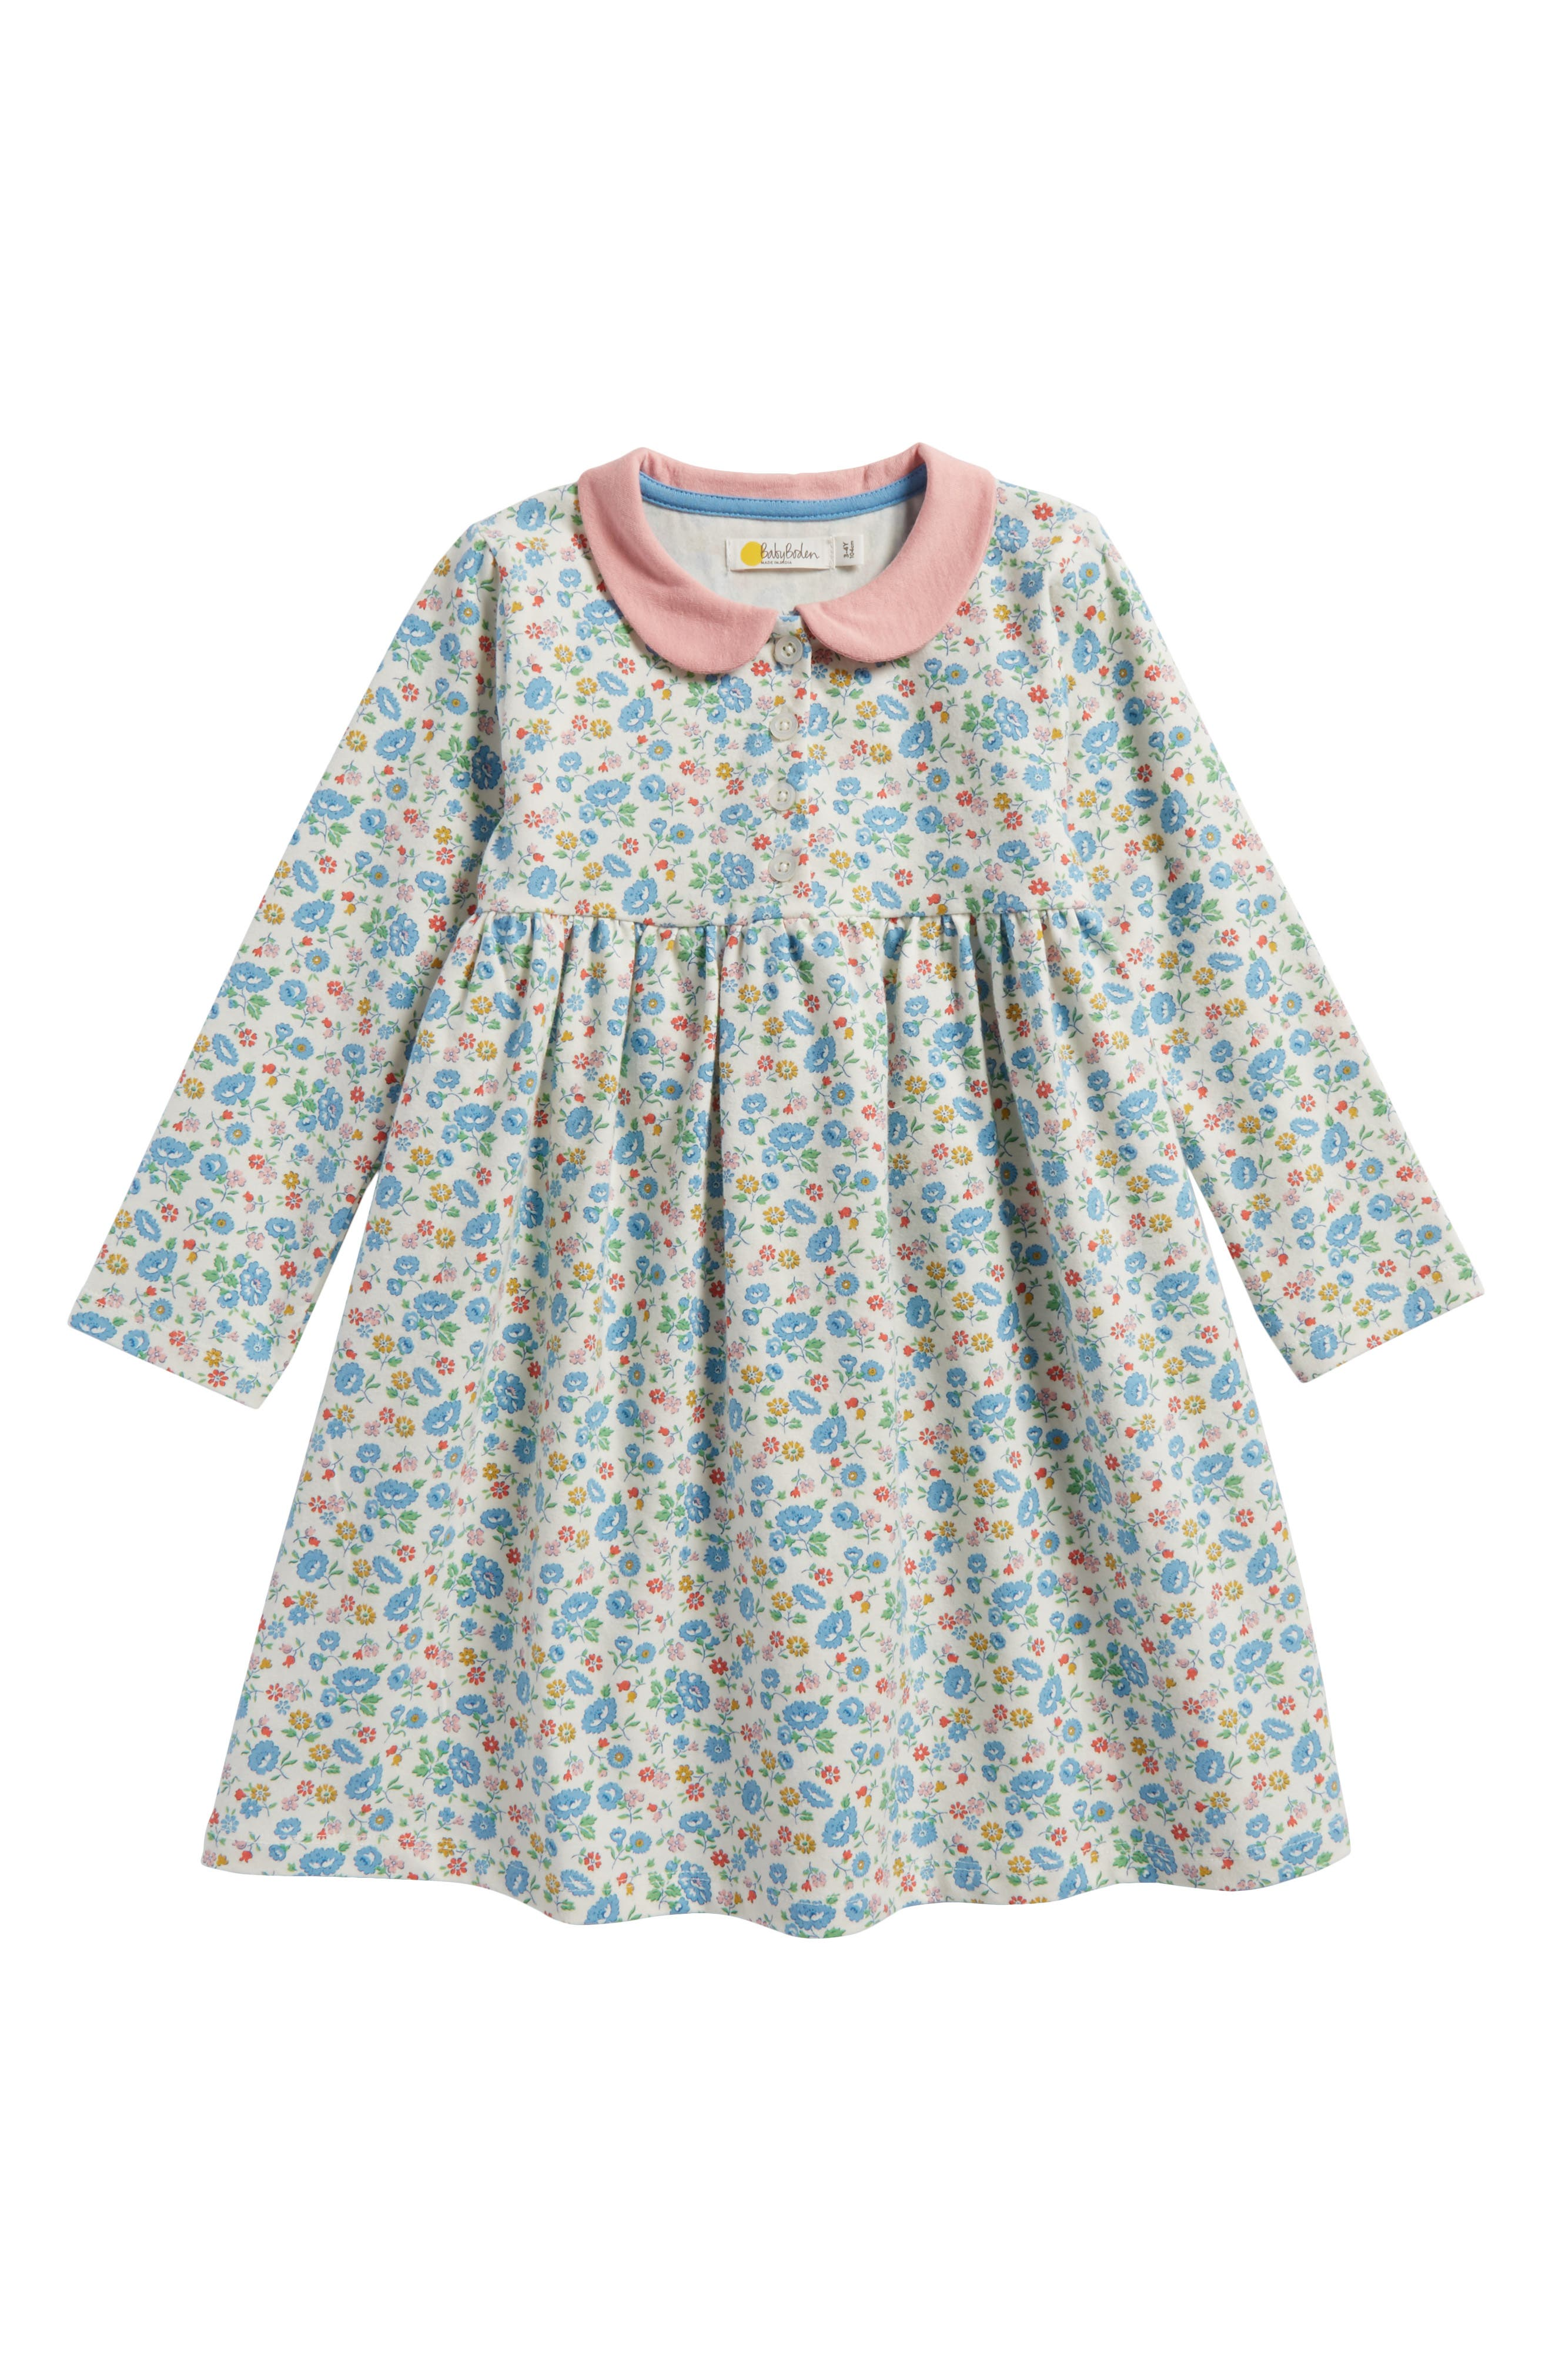 Pretty Peter Pan Collar Jersey Dress,                             Main thumbnail 1, color,                             Ecru Summer Floral